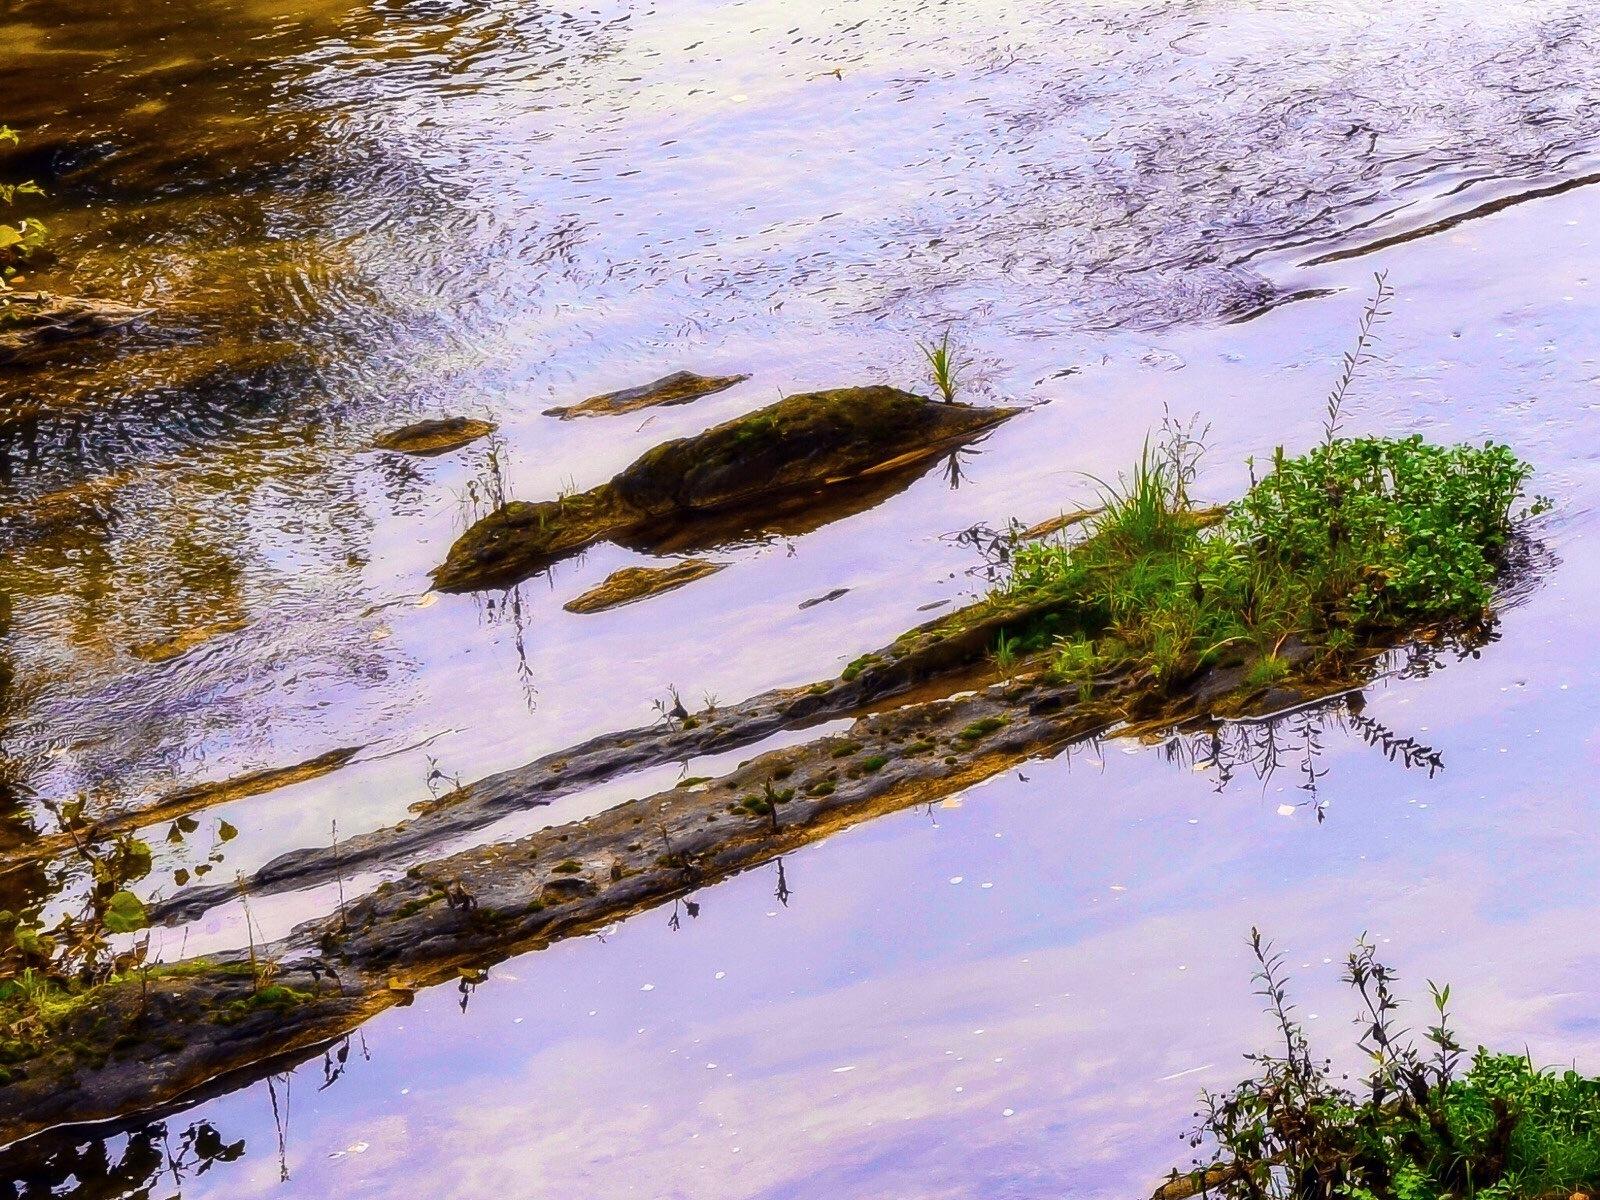 River fantasies by Diana